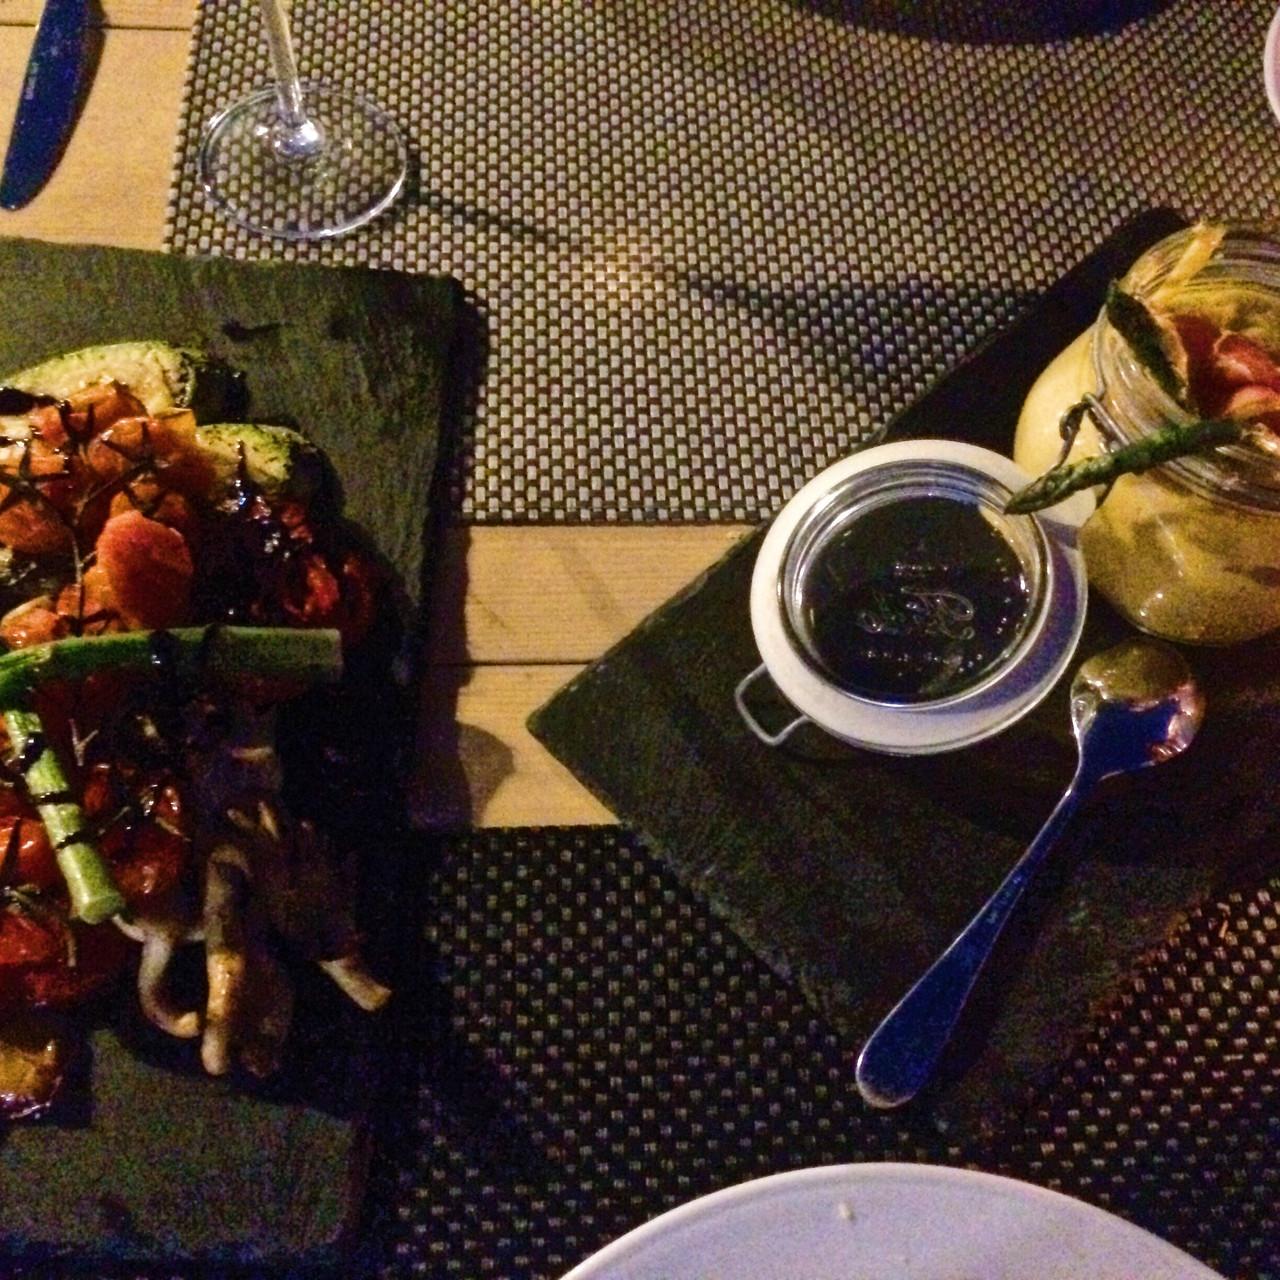 Grilled vegetables marinated with olive oil and Santorinian vinegar, and the white truffle oil fava, grilled asparagus, and prosciutto Serrano at Aegaen Safari restaurant in Perivolos, Santorini, Greece